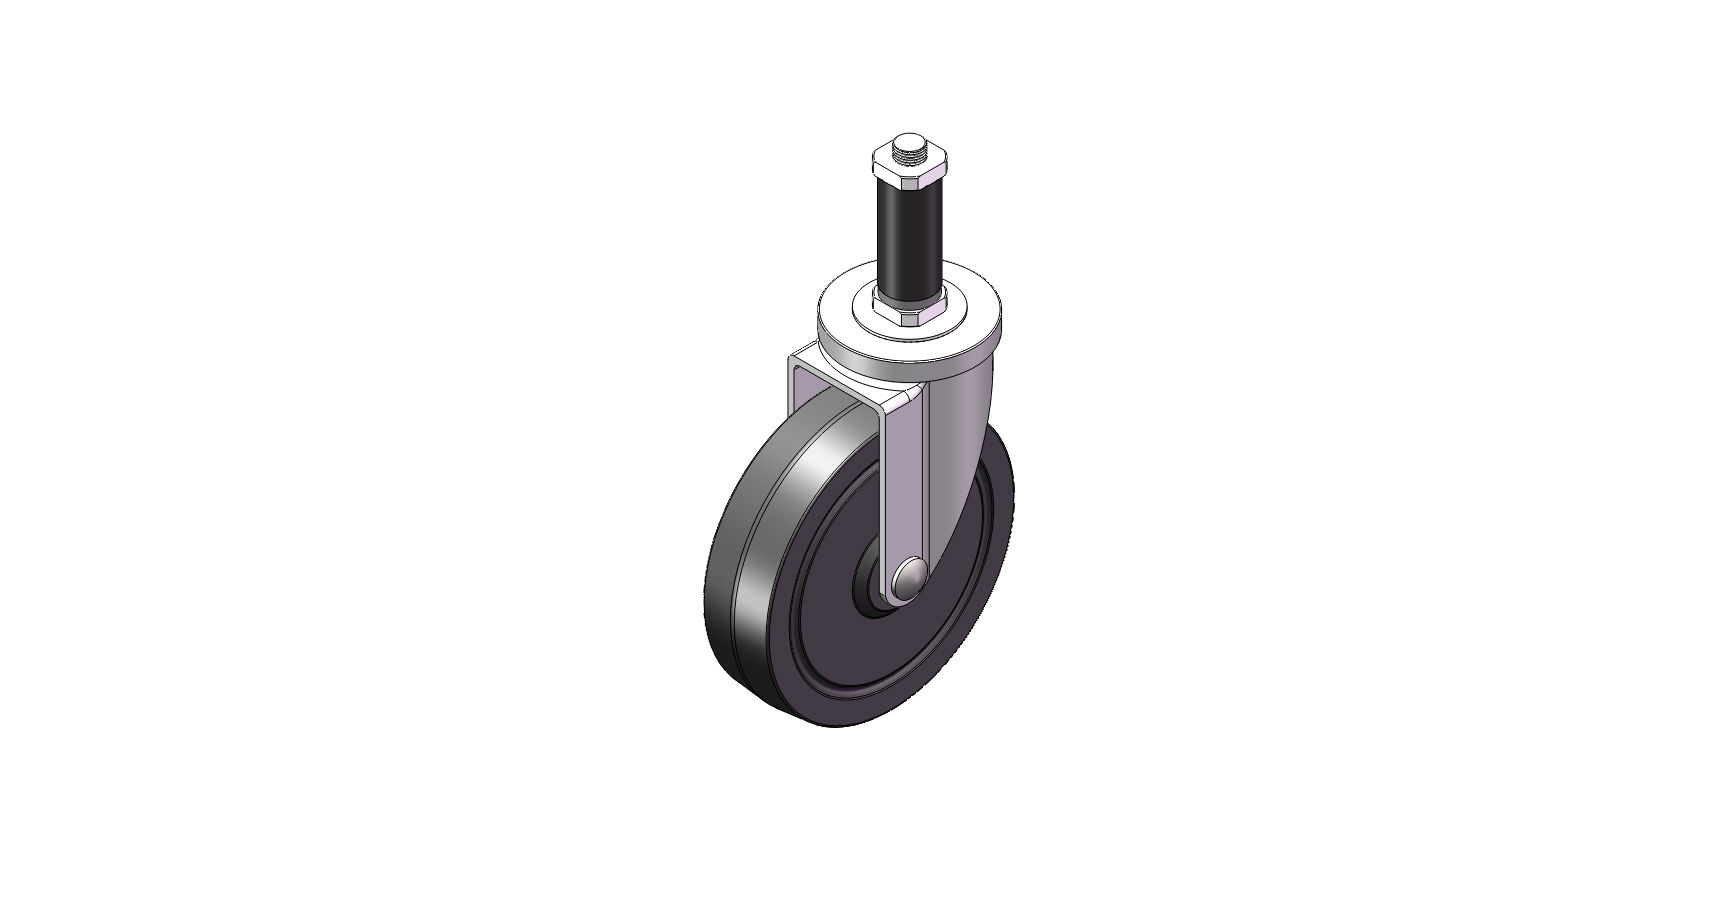 5x1.25膨脹橡膠橡膠活動輪2.JPG